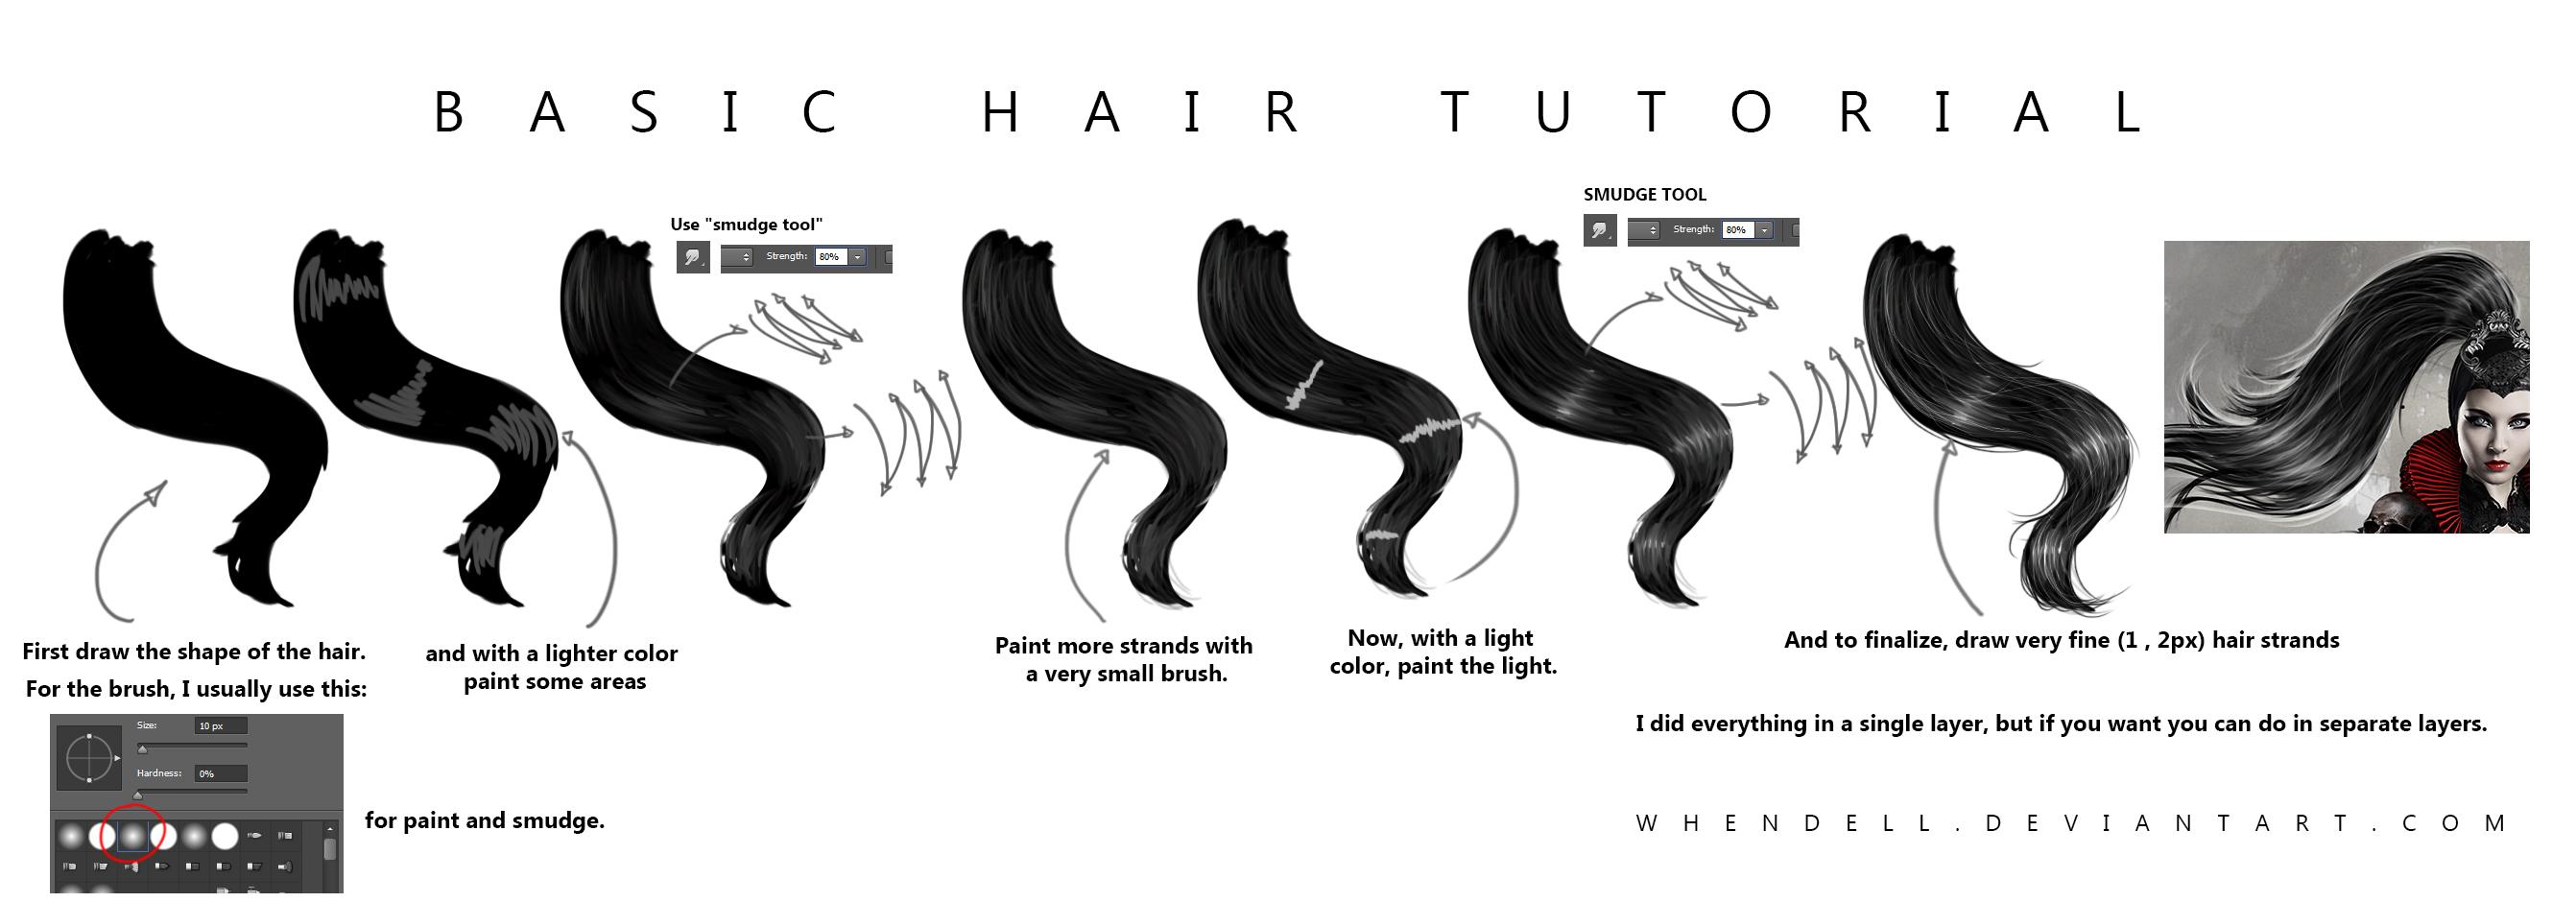 Basic Hair Tutorial by Whendell